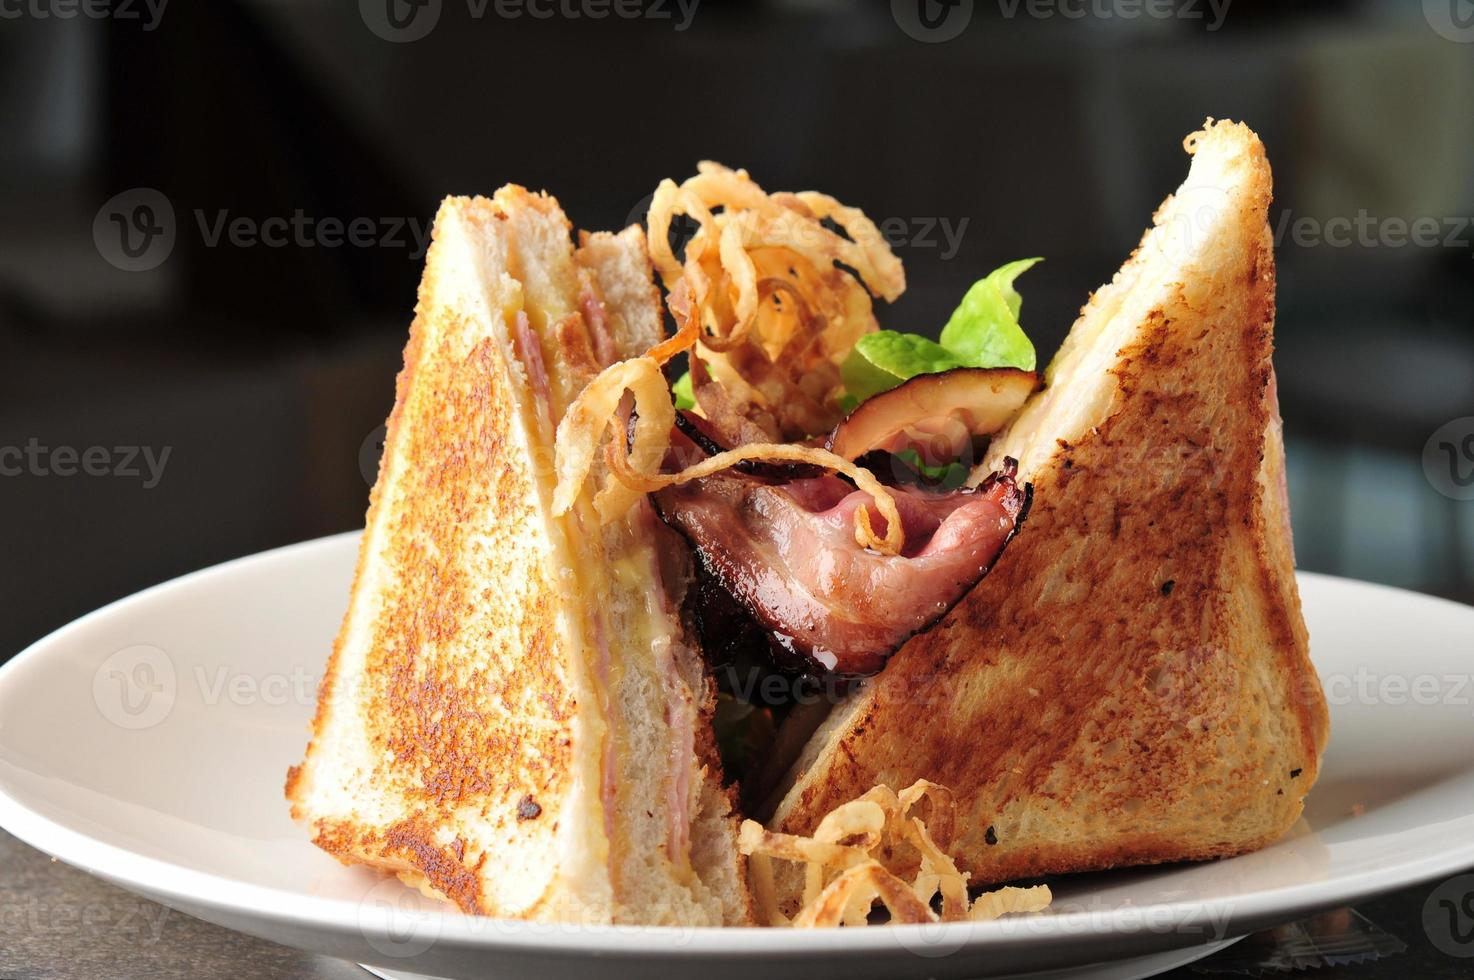 Zwei-Club-Sandwich mit gebackenem Speck foto